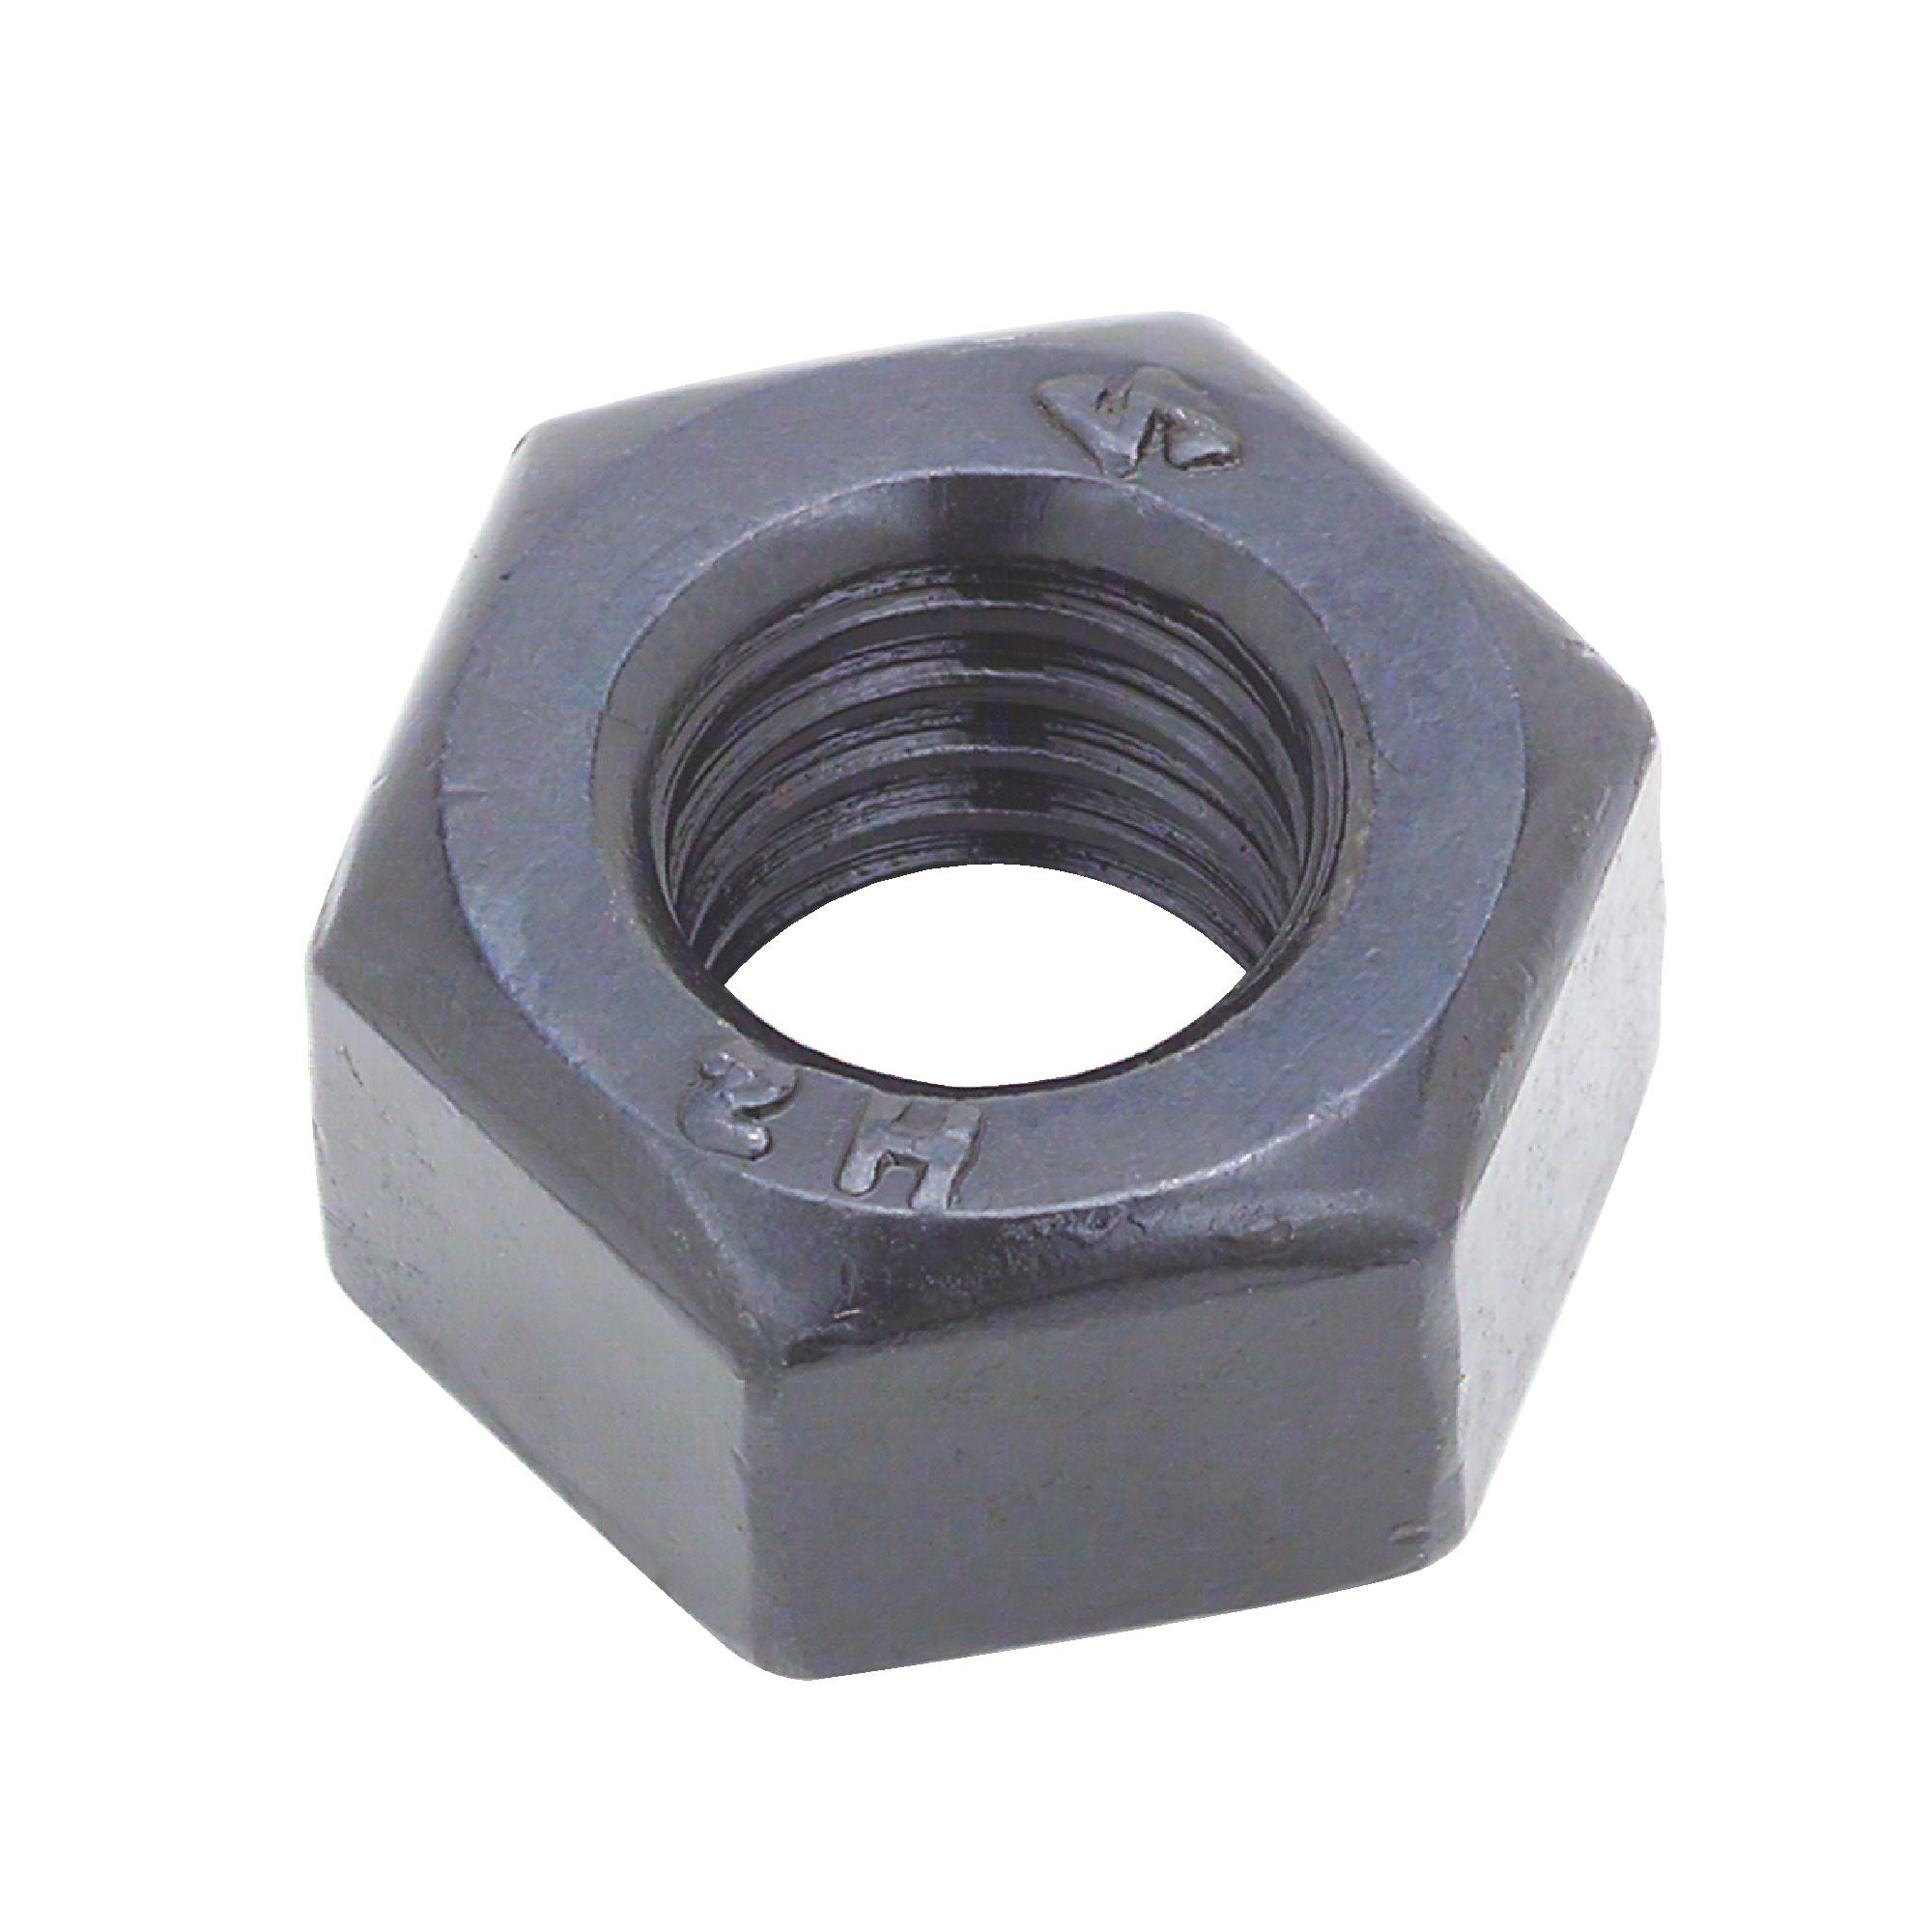 Hardened Hexagon Nut